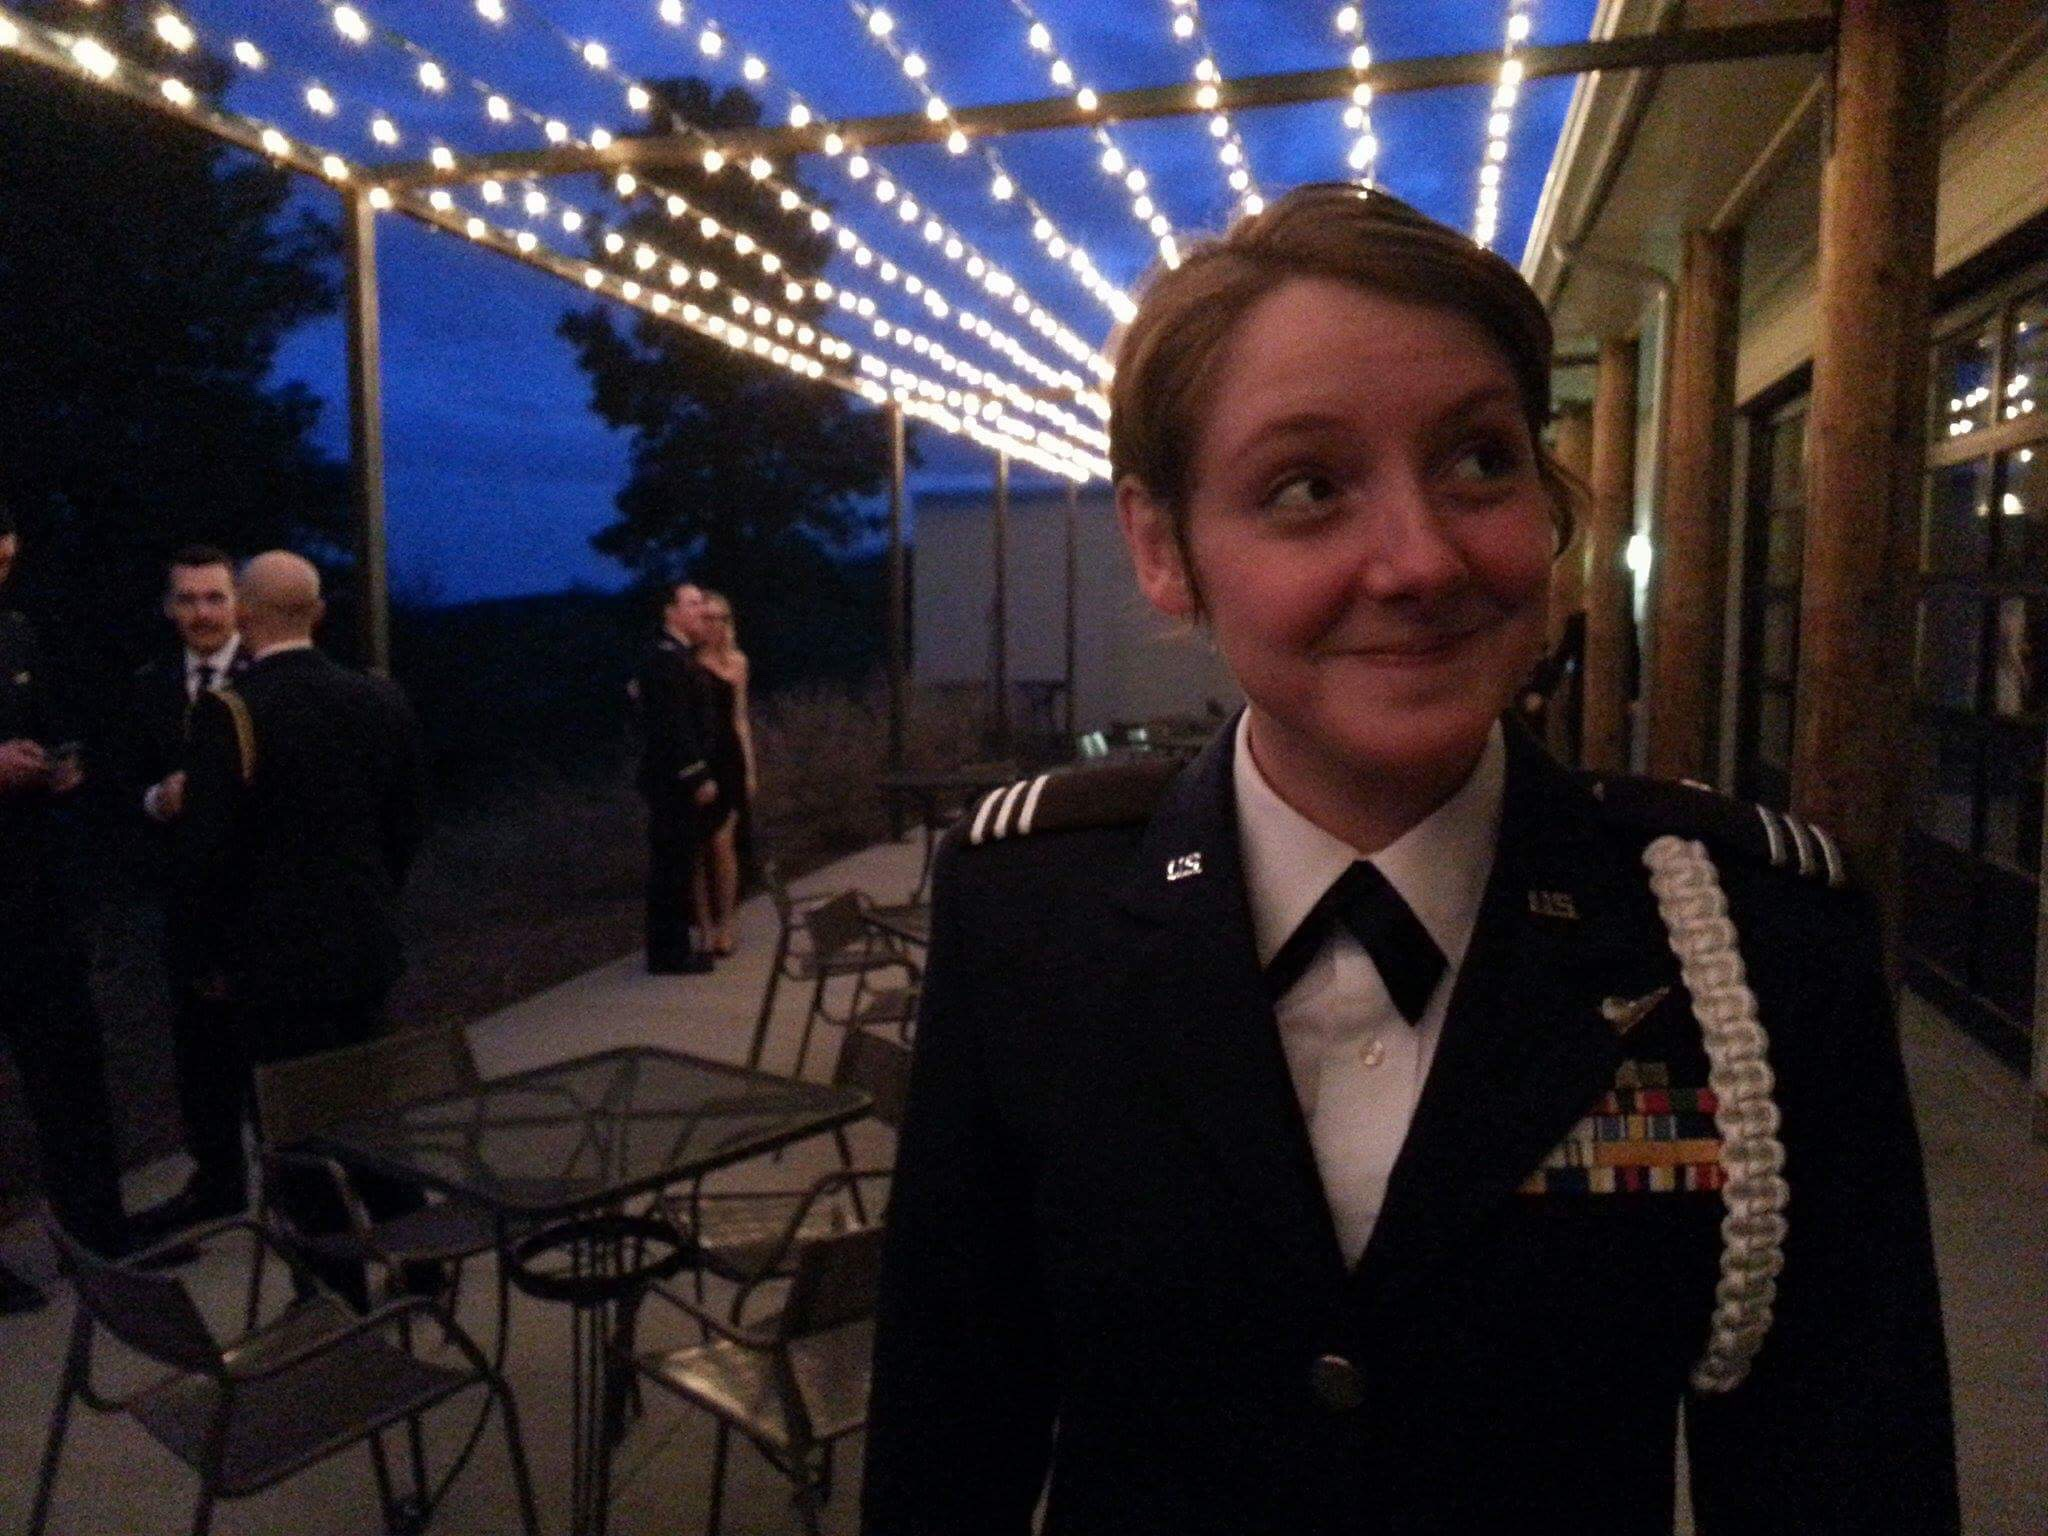 Cadet Berreth smiling in Service Dress